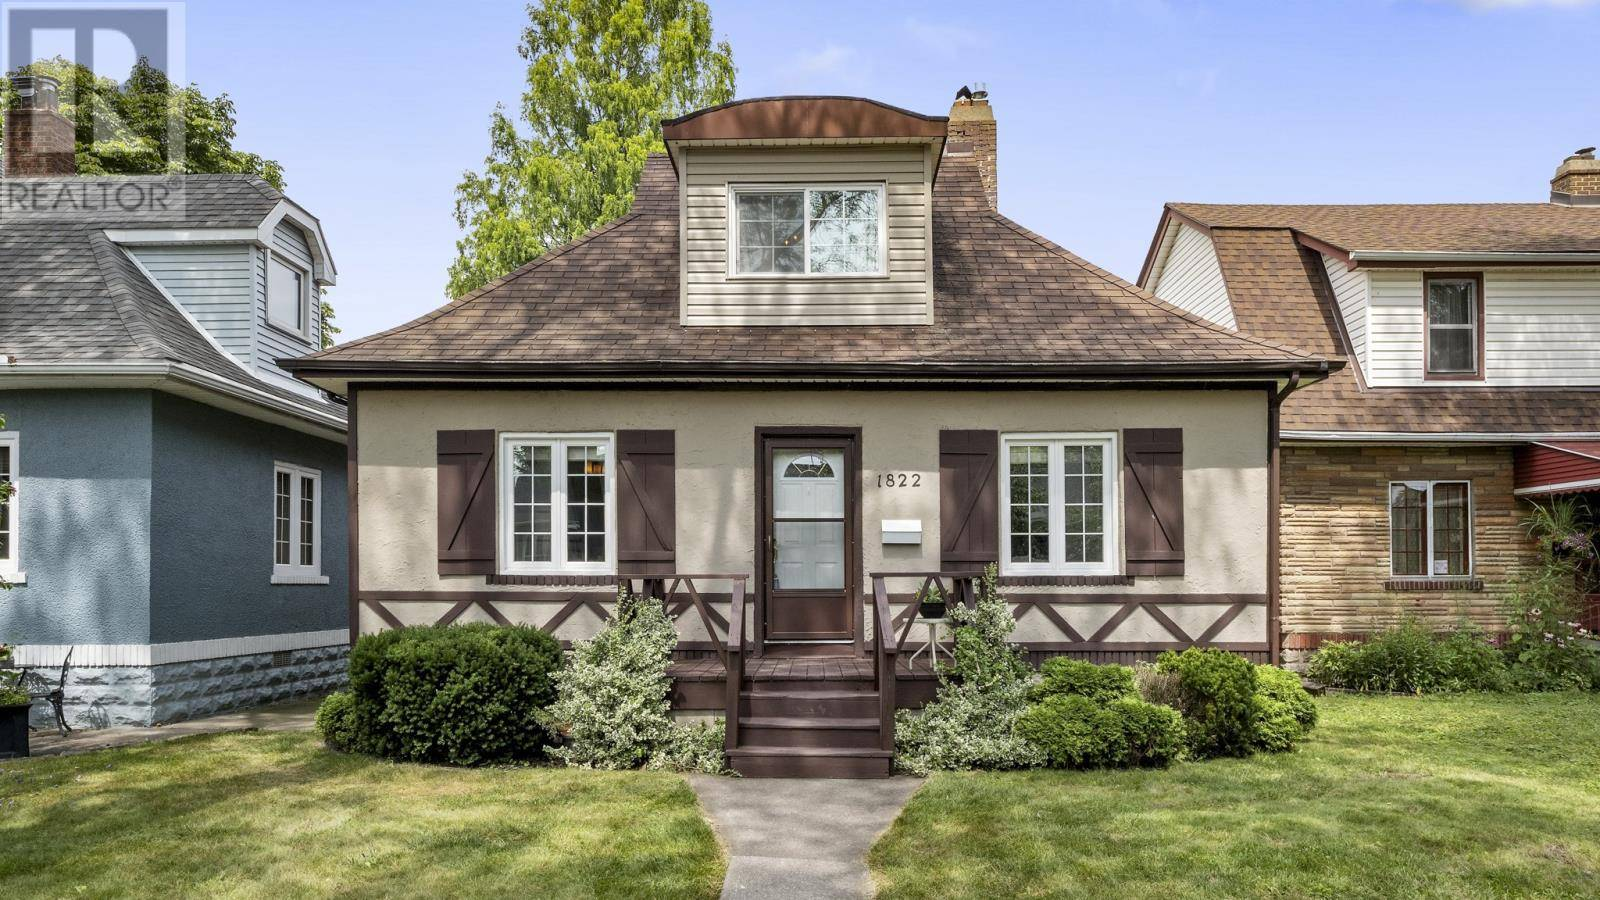 House for sale at 1822 Dacotah  Windsor Ontario - MLS: 19023531